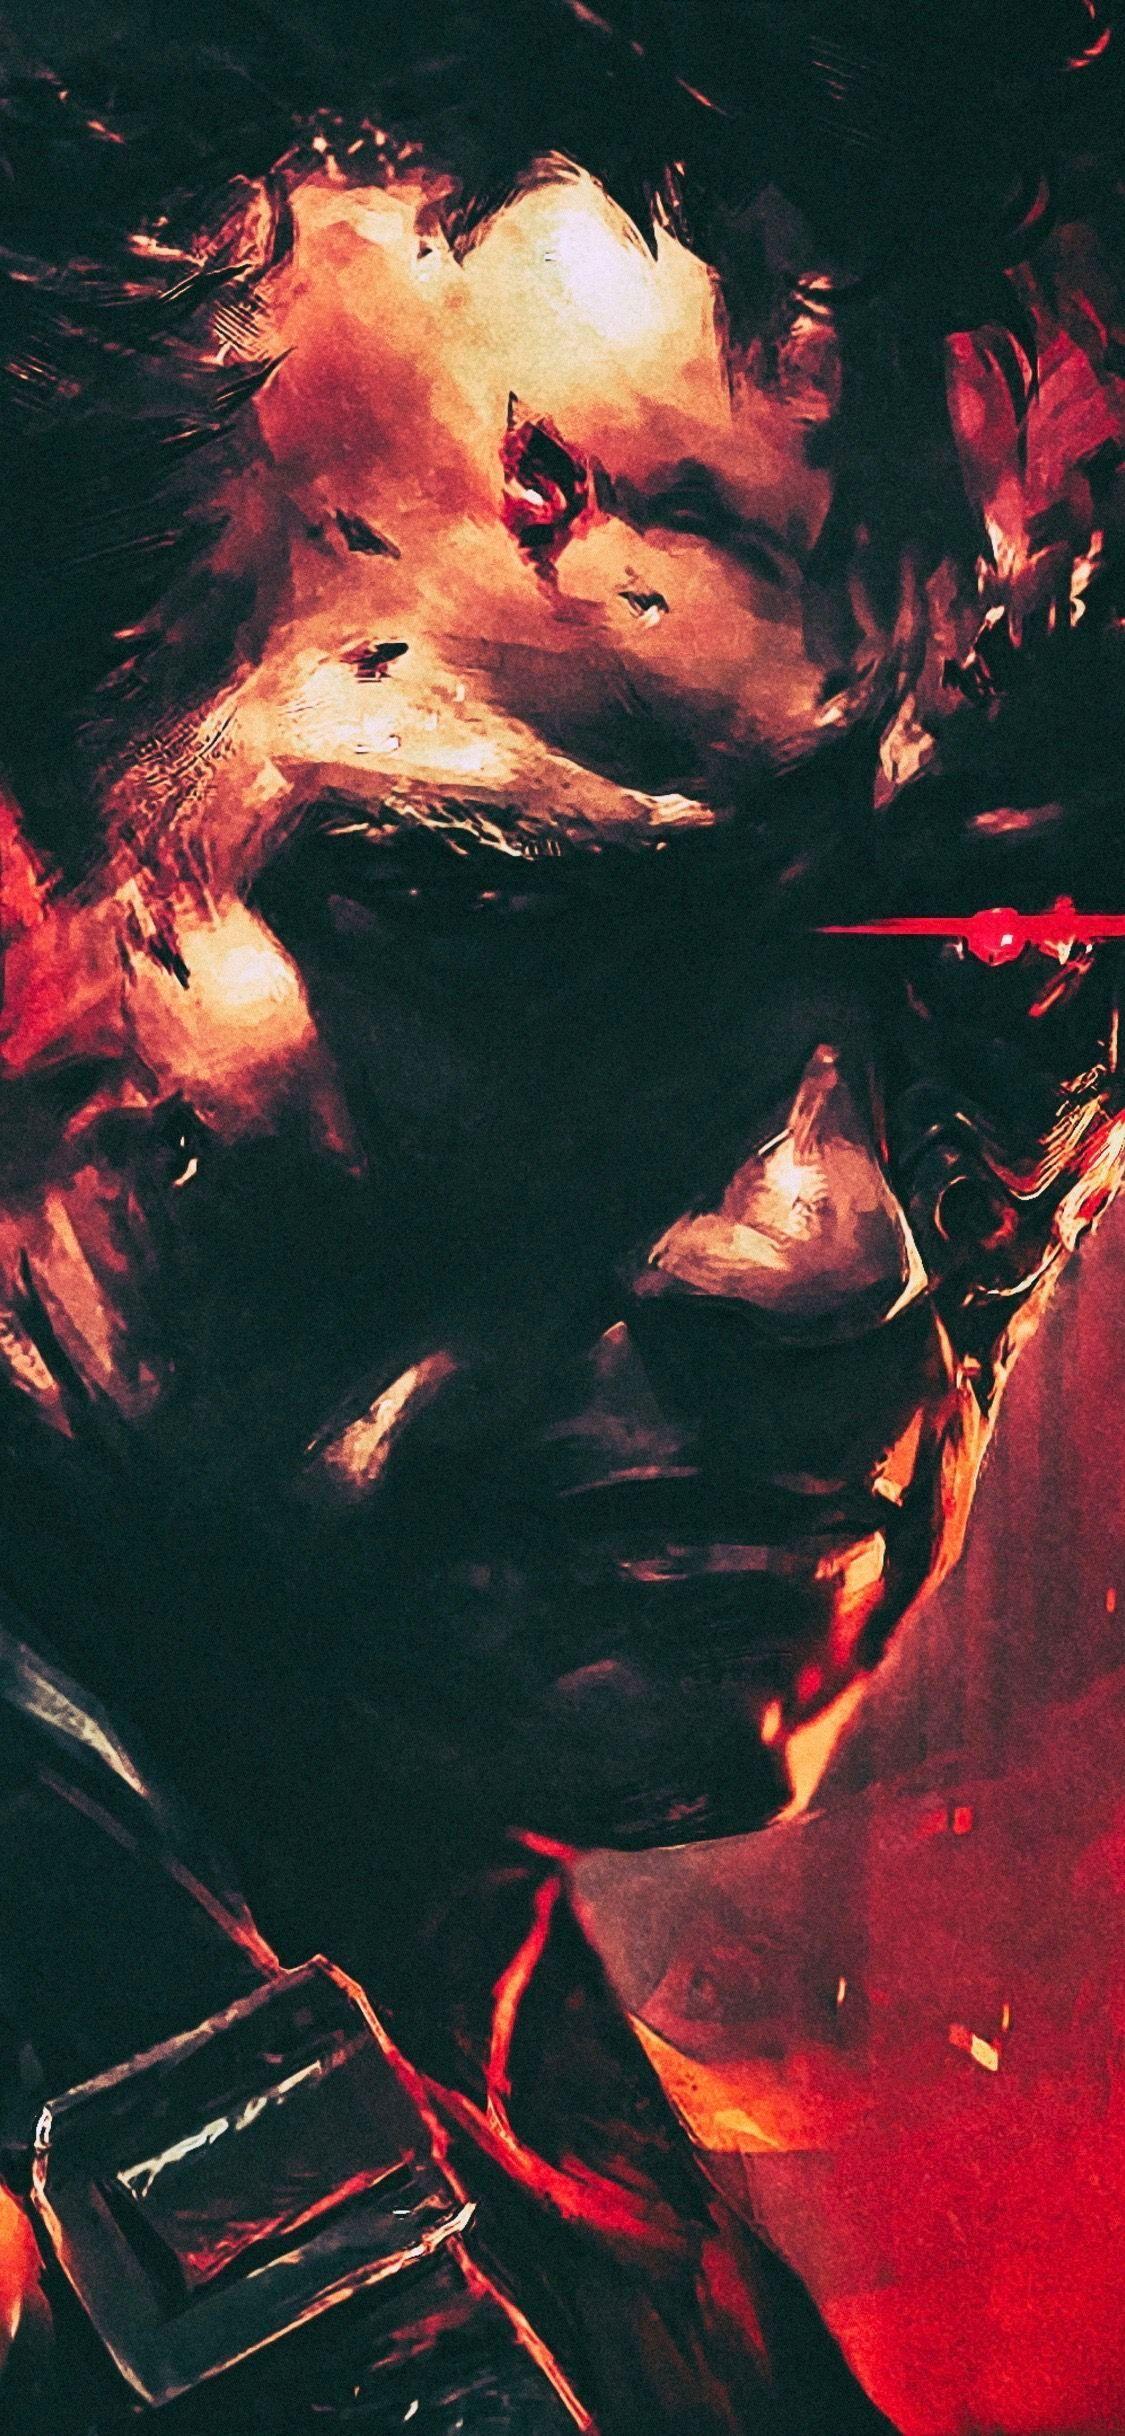 The Terminator Arnold Classic Movie Premium METAL Poster Art Print Gift